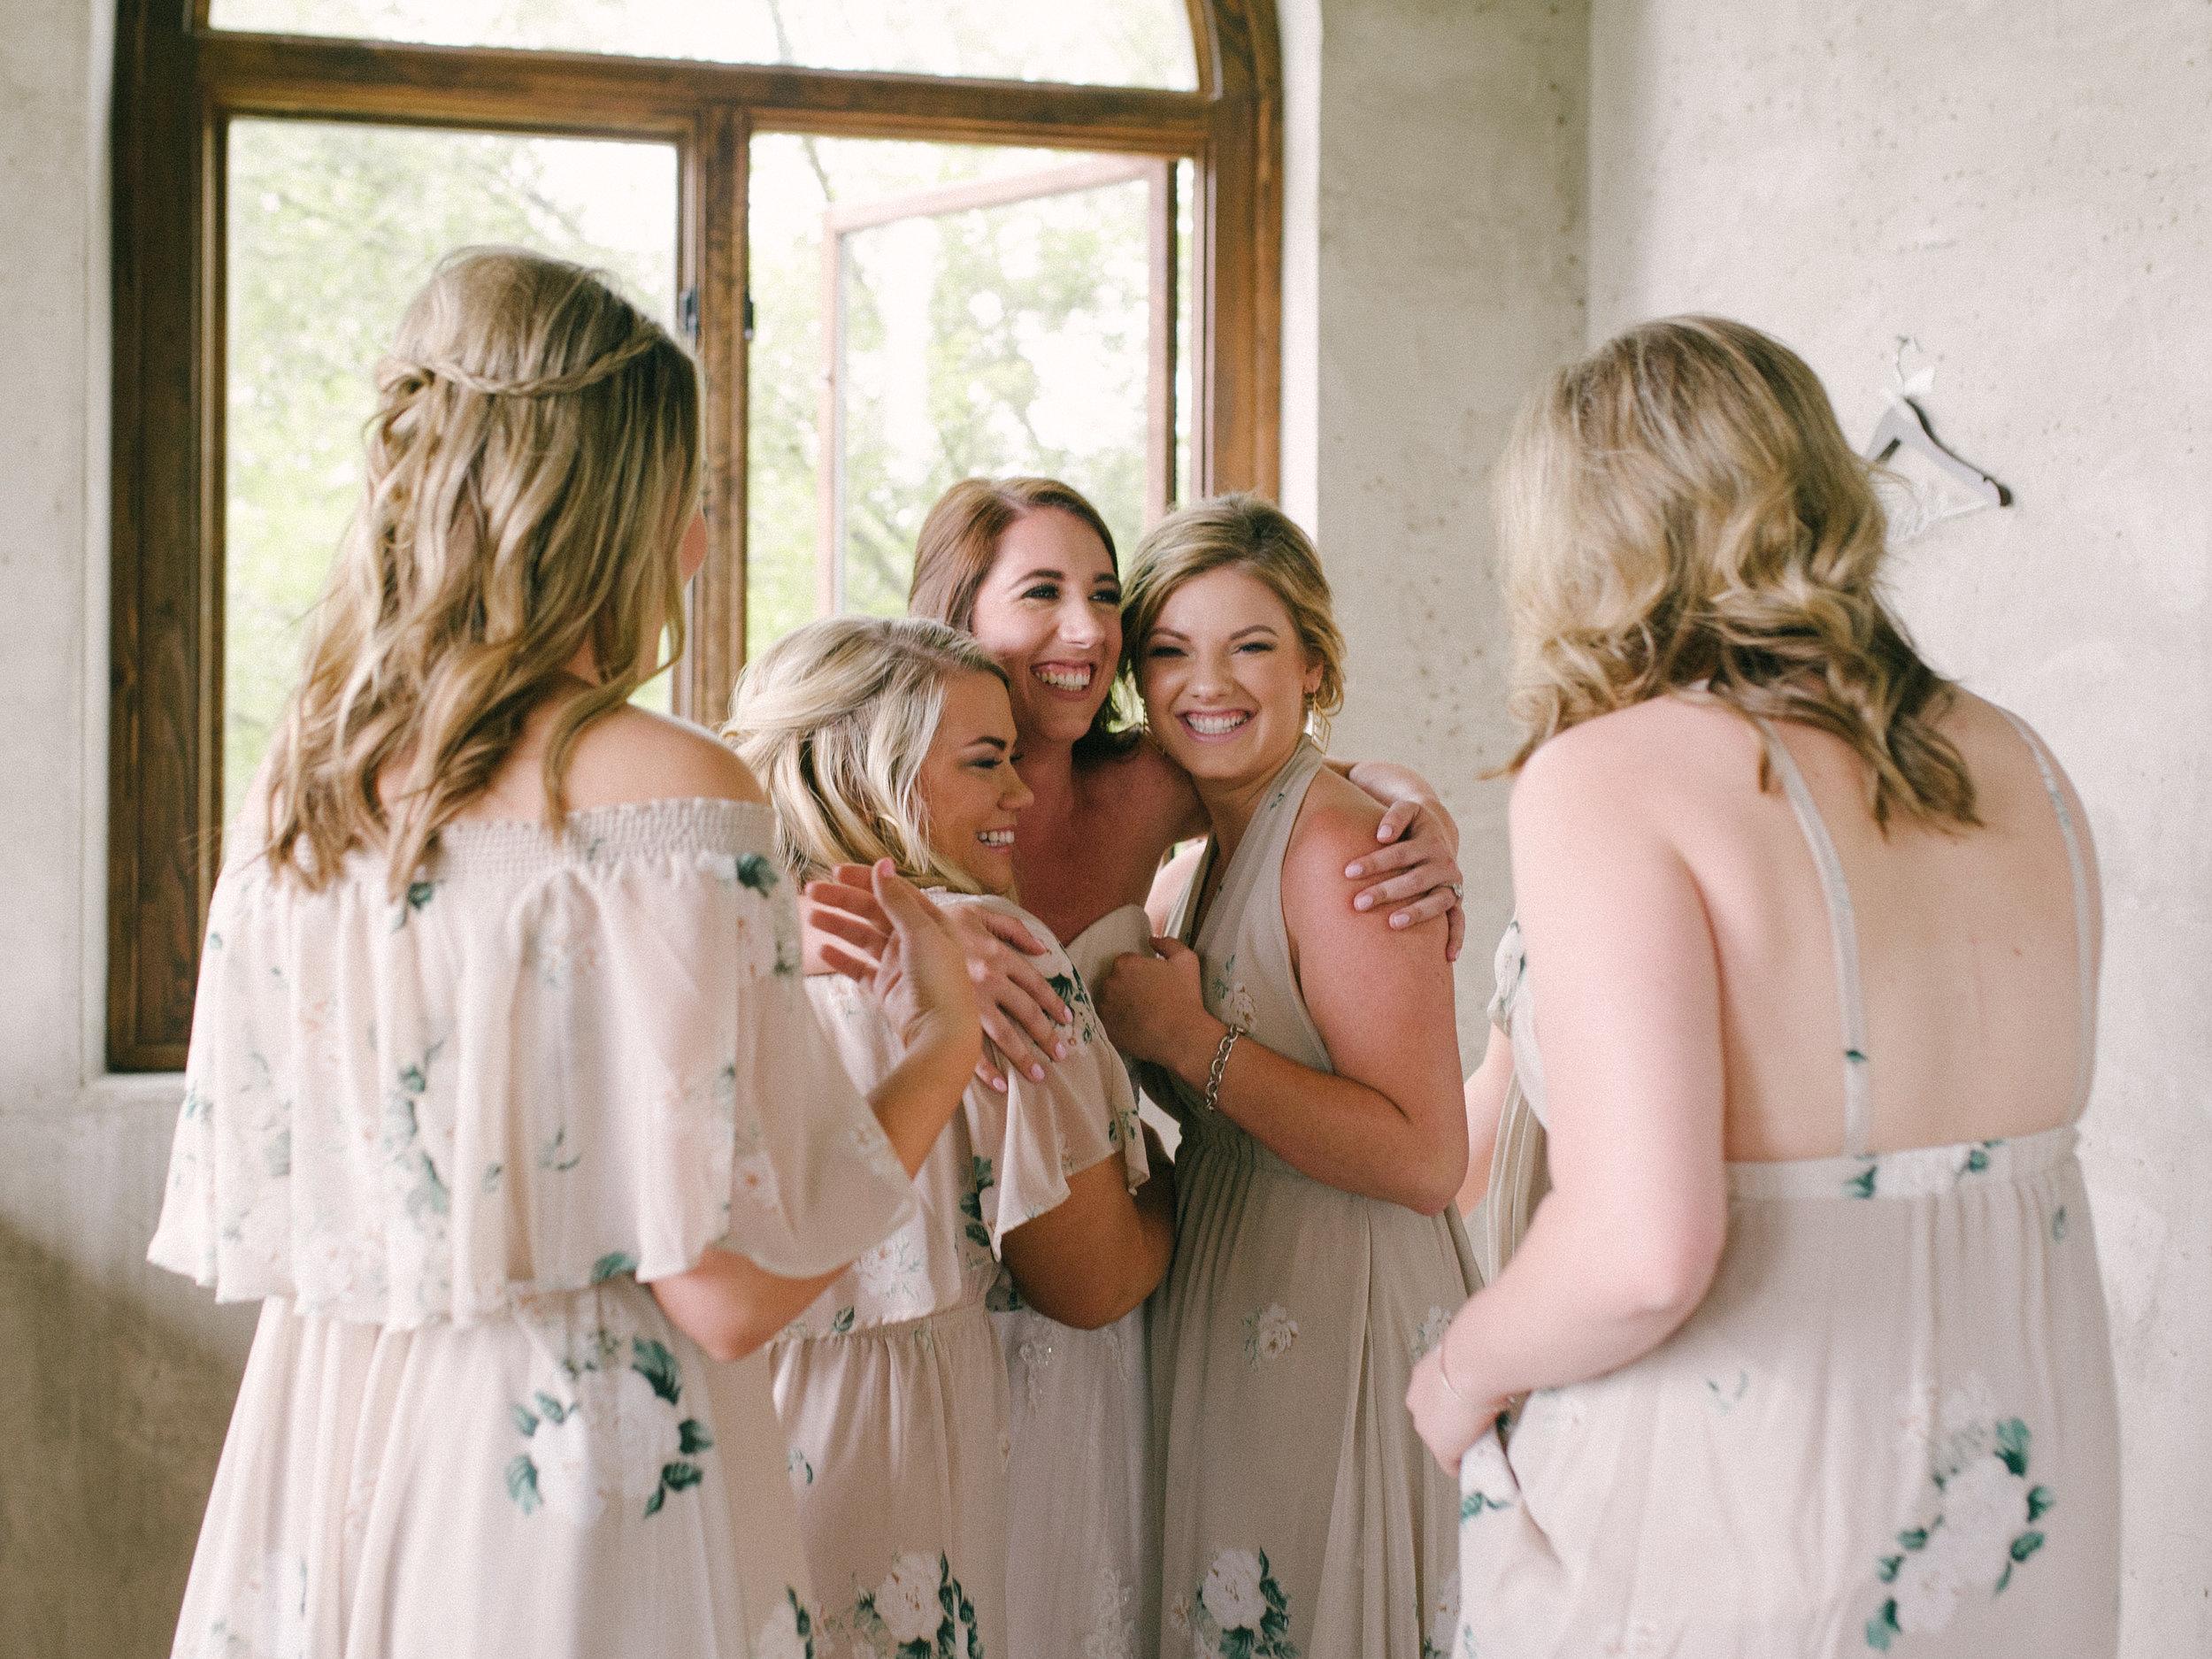 Romantic-Summerour-studio-wedding-hannah-forsberg-atlanta-wedding-photographer18.JPG